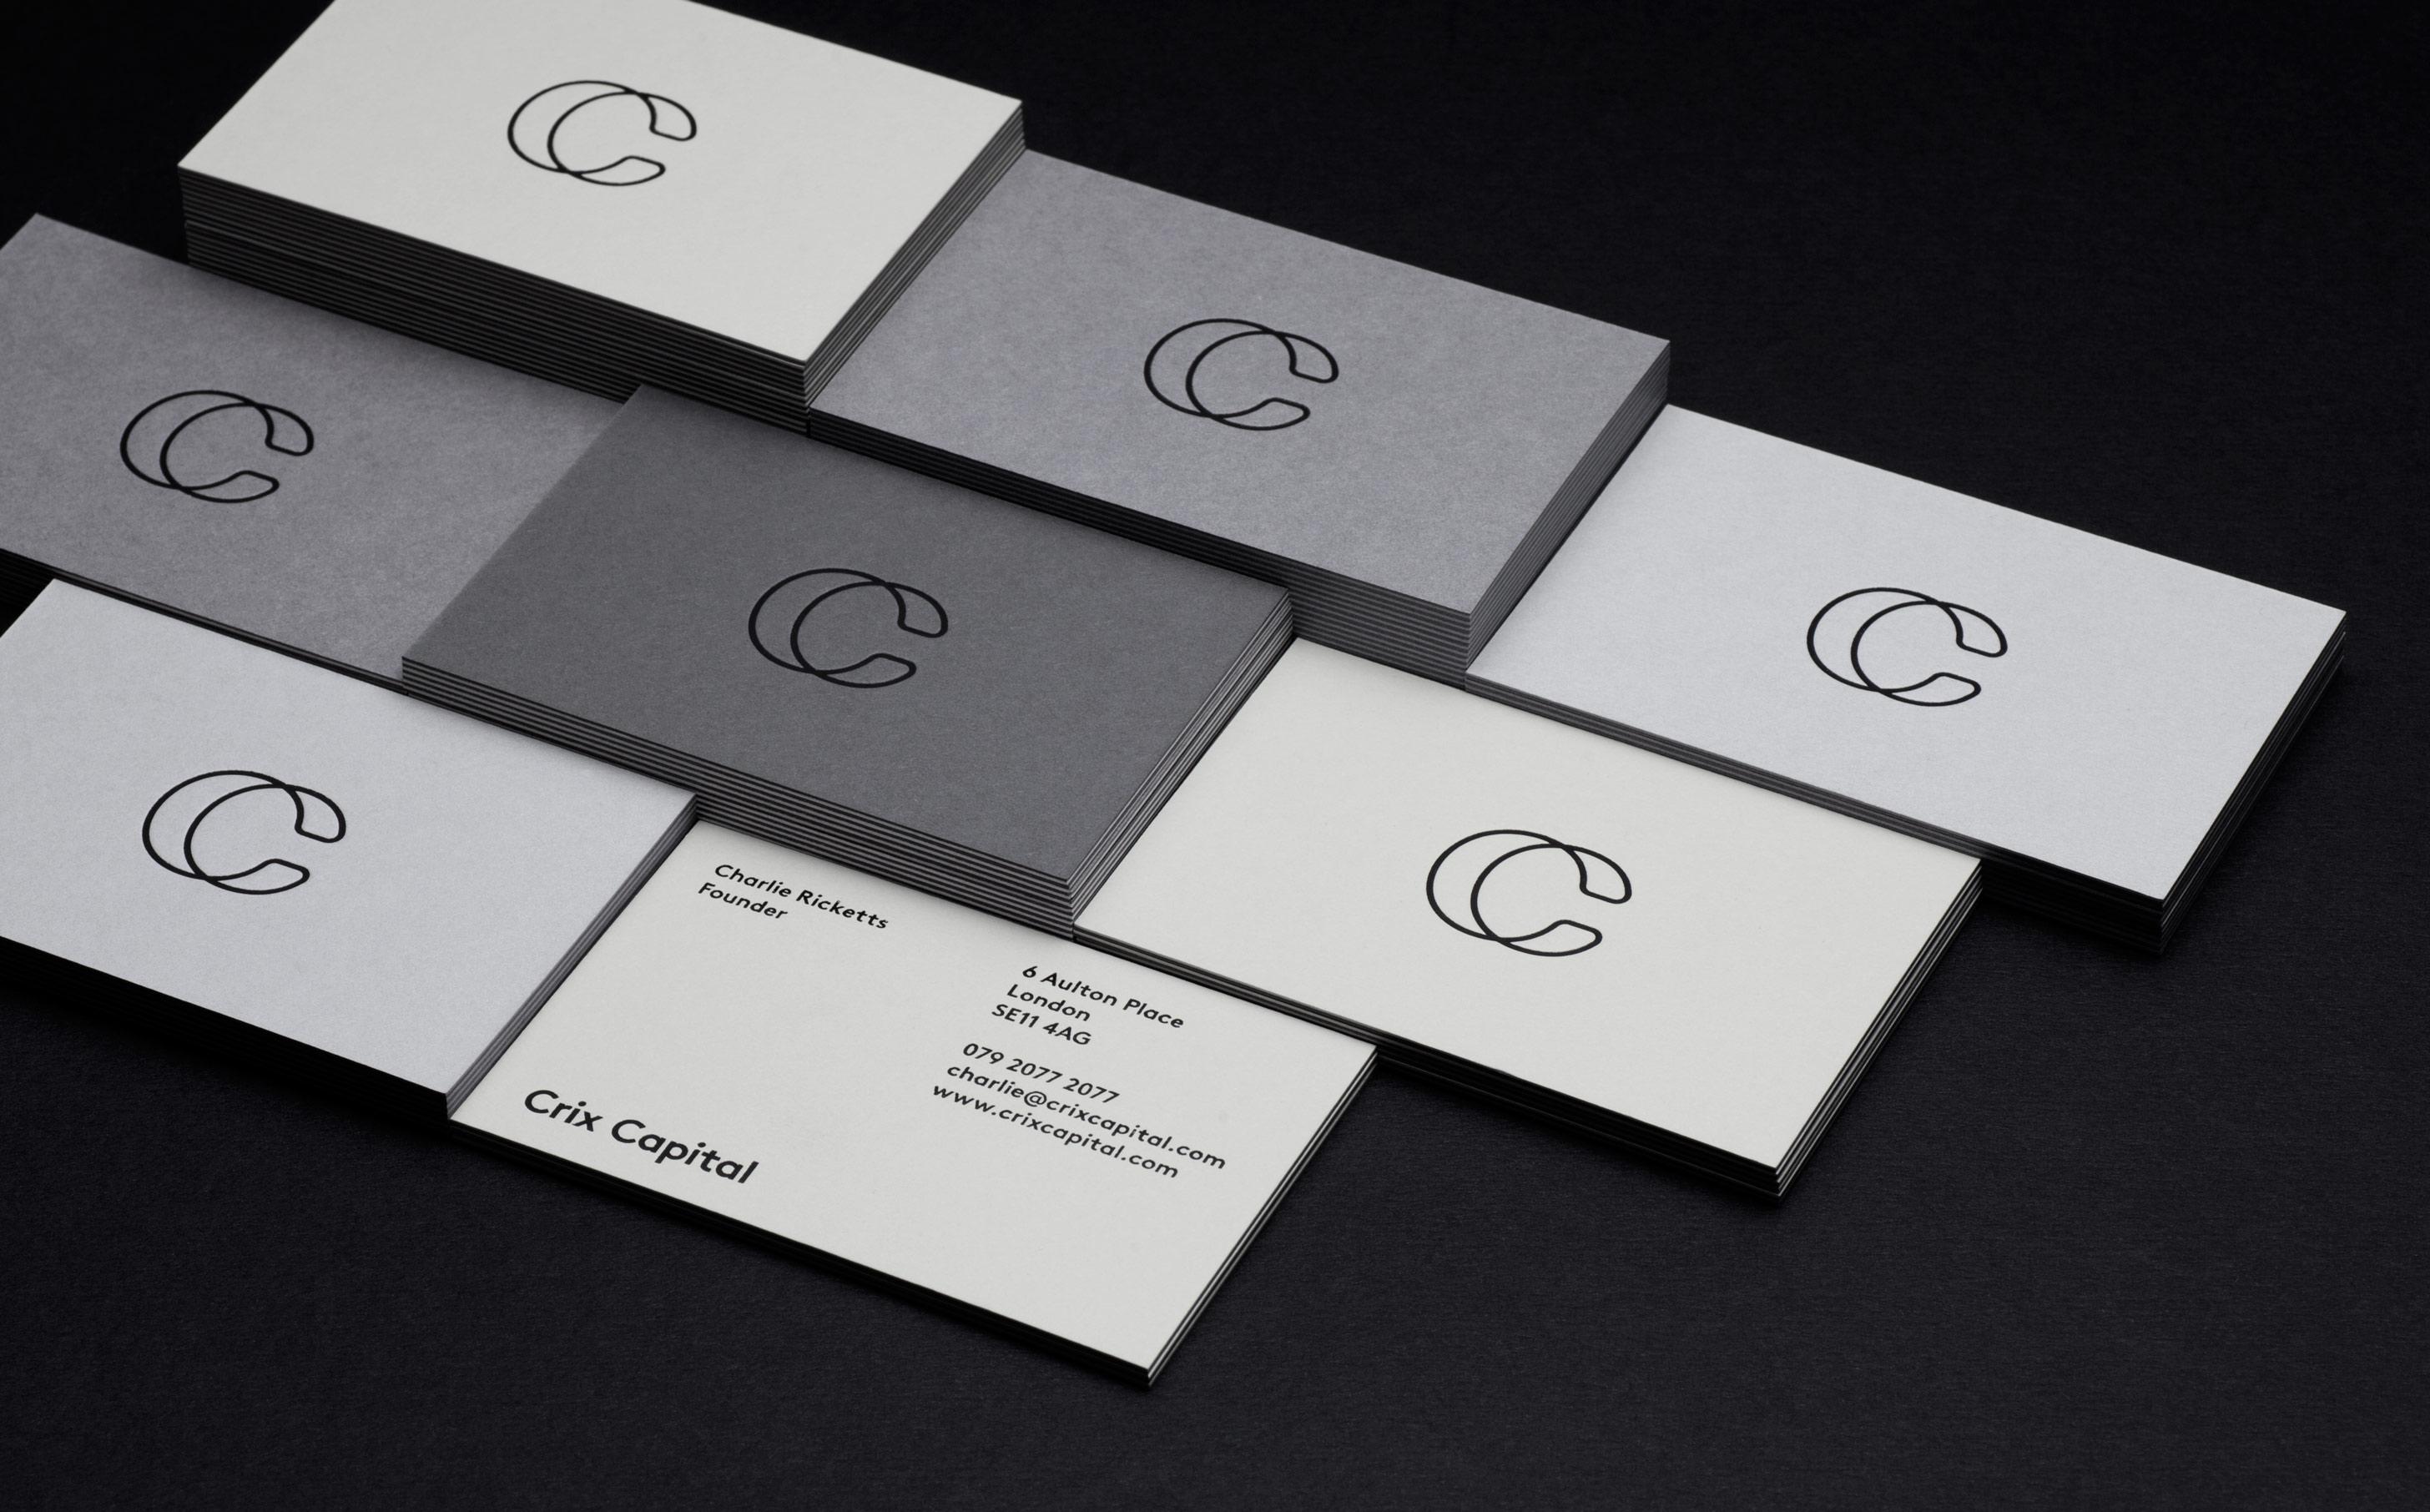 Business-card-design-crix-capital-london-01